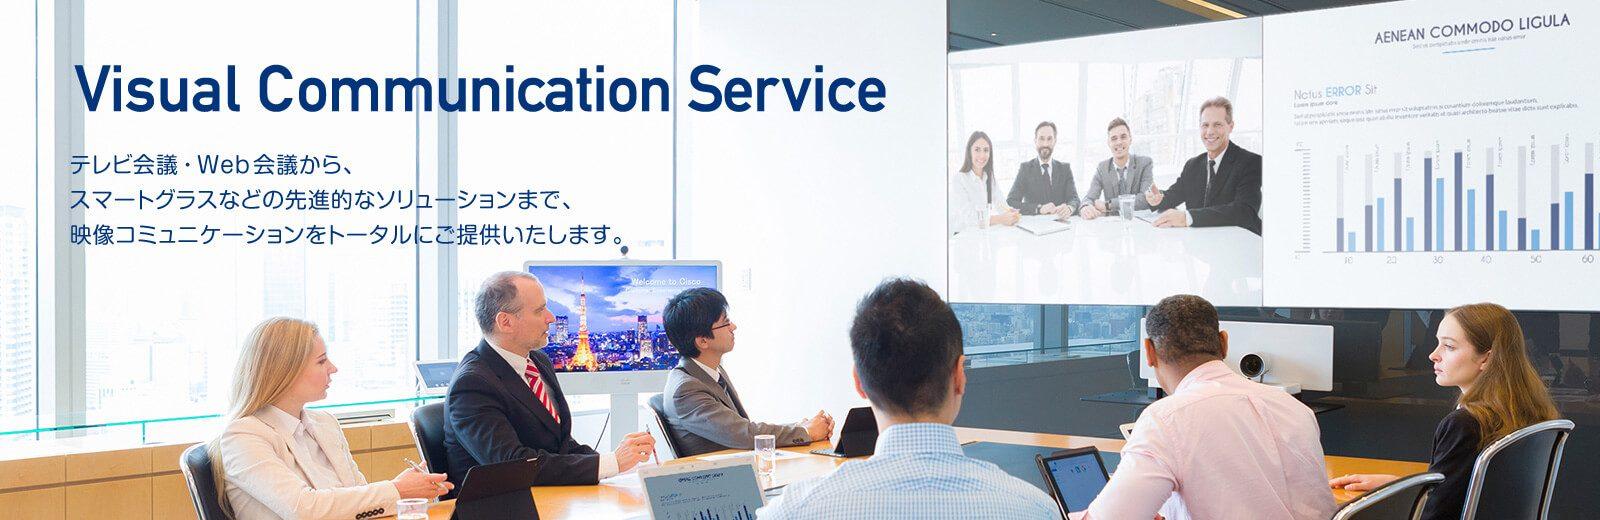 Visual Communication Servise